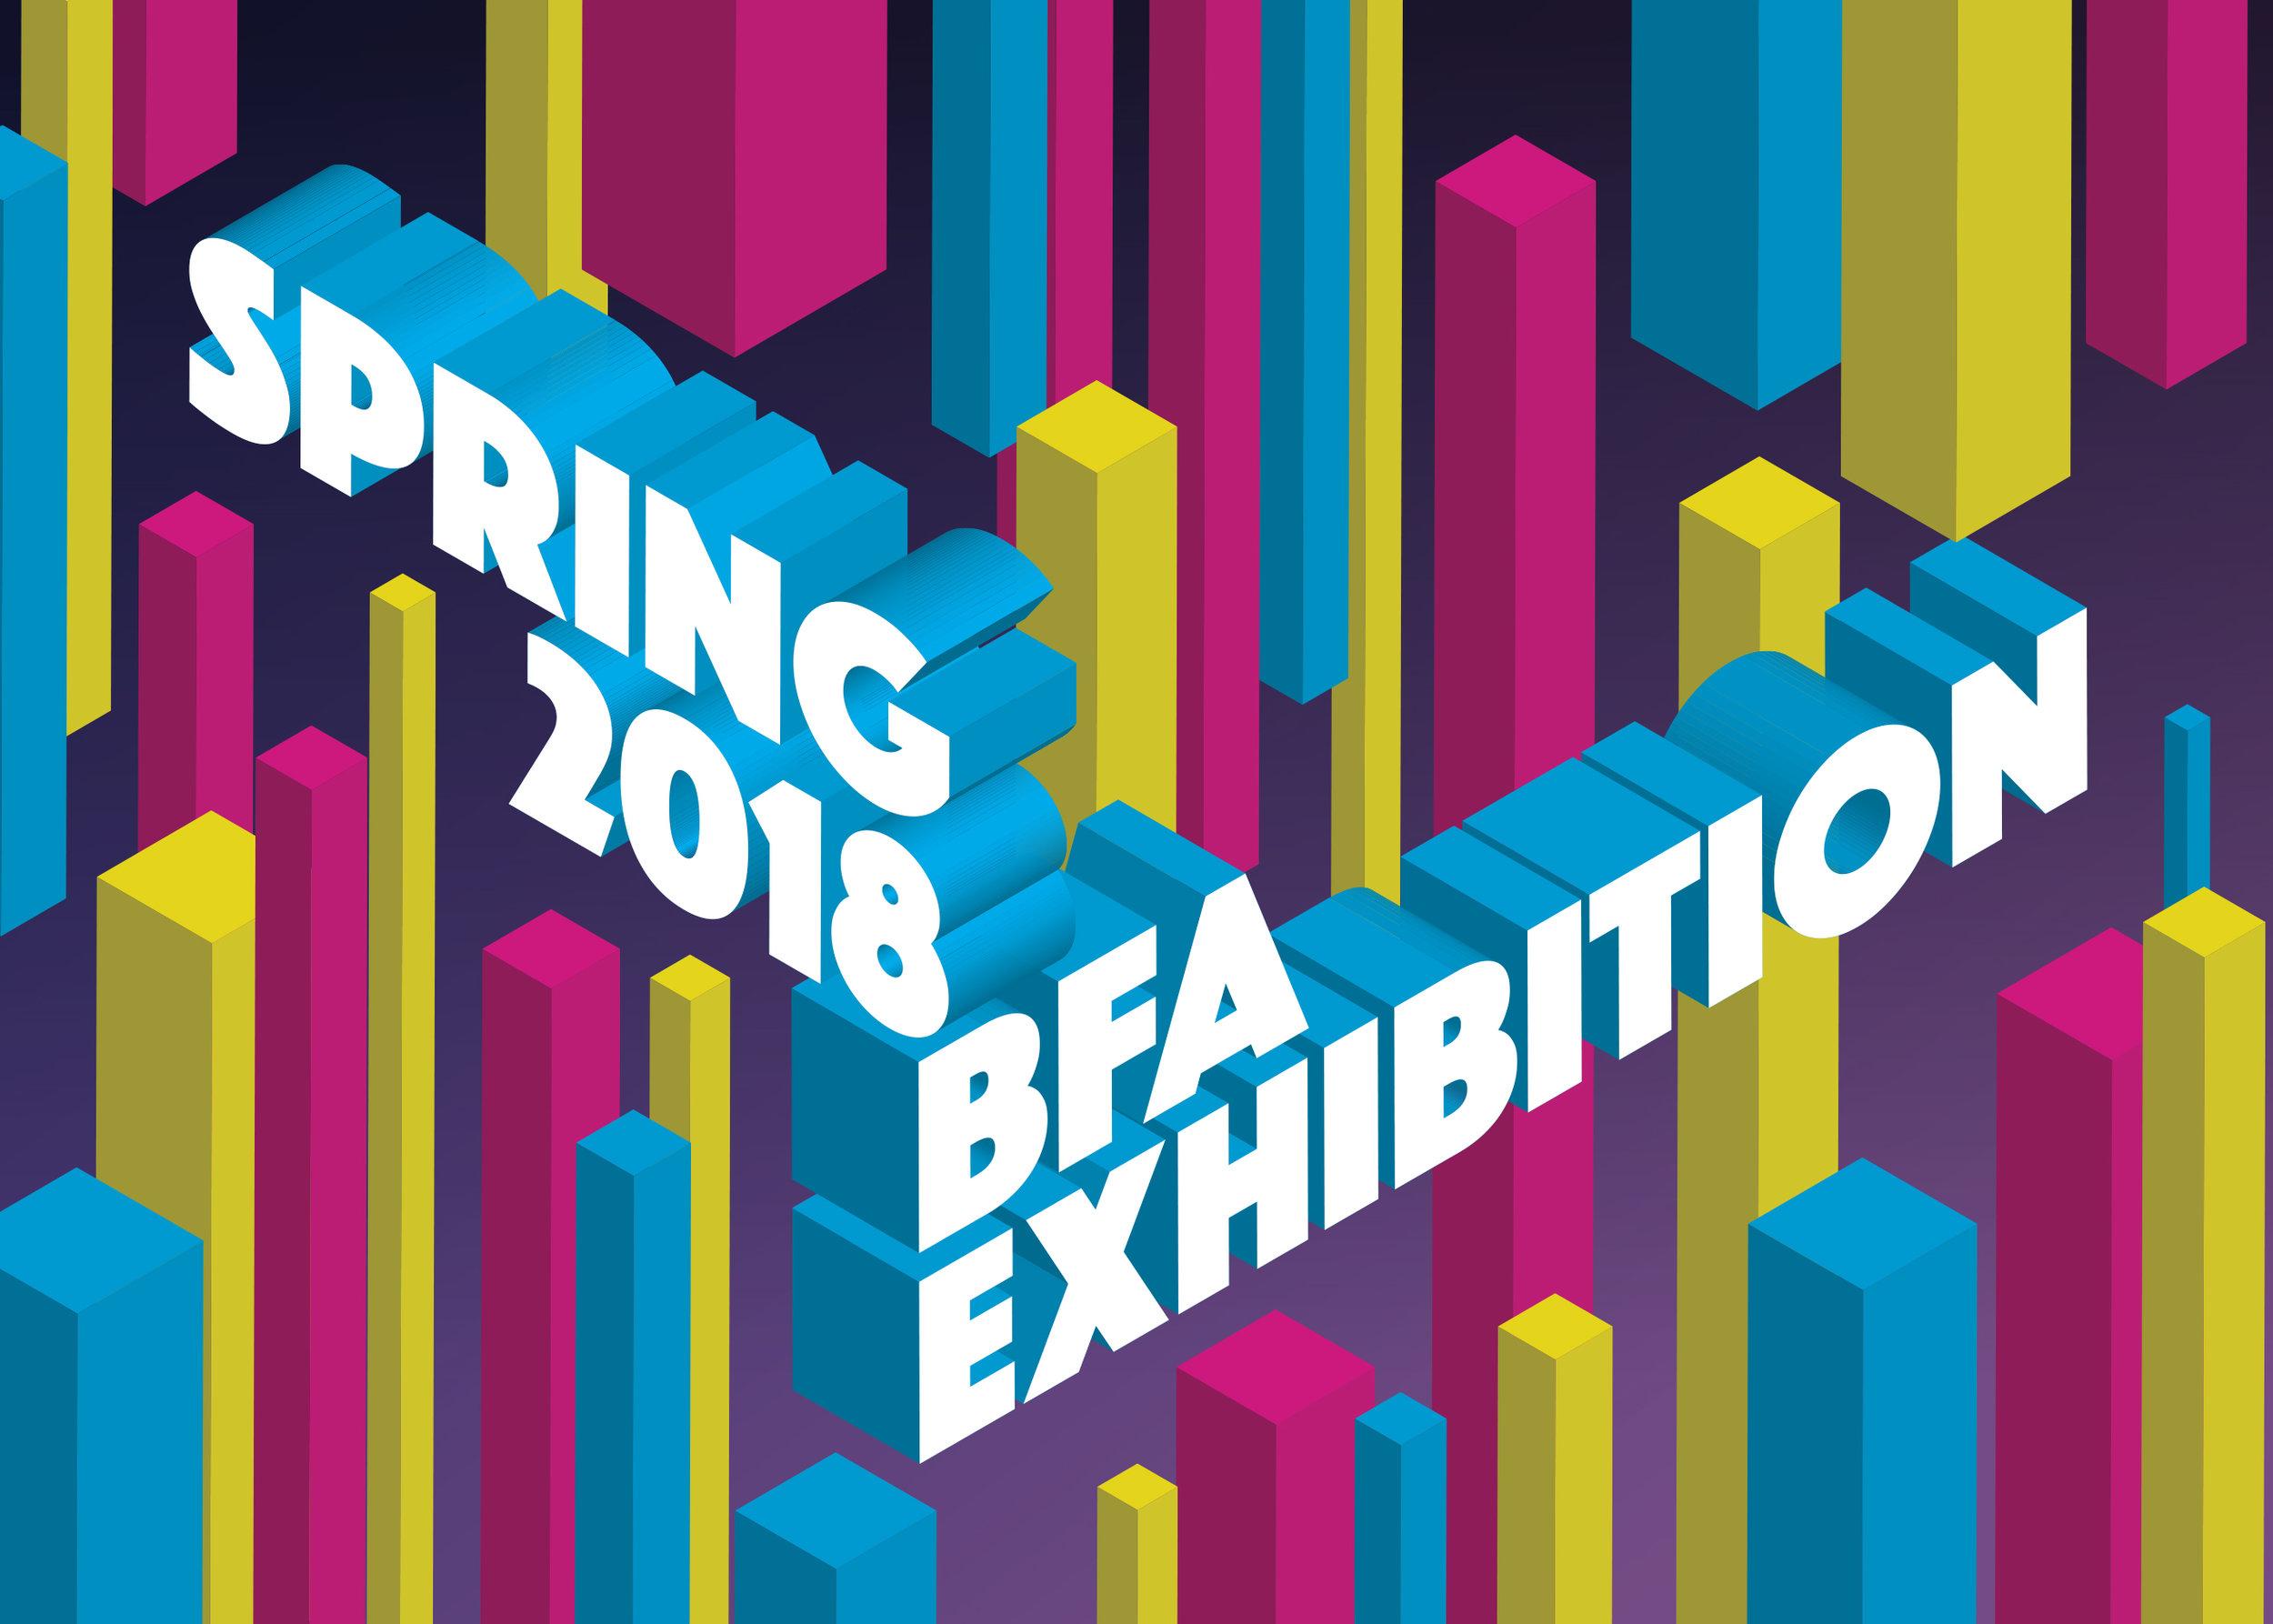 bfa exhibition postcard options-2.jpg